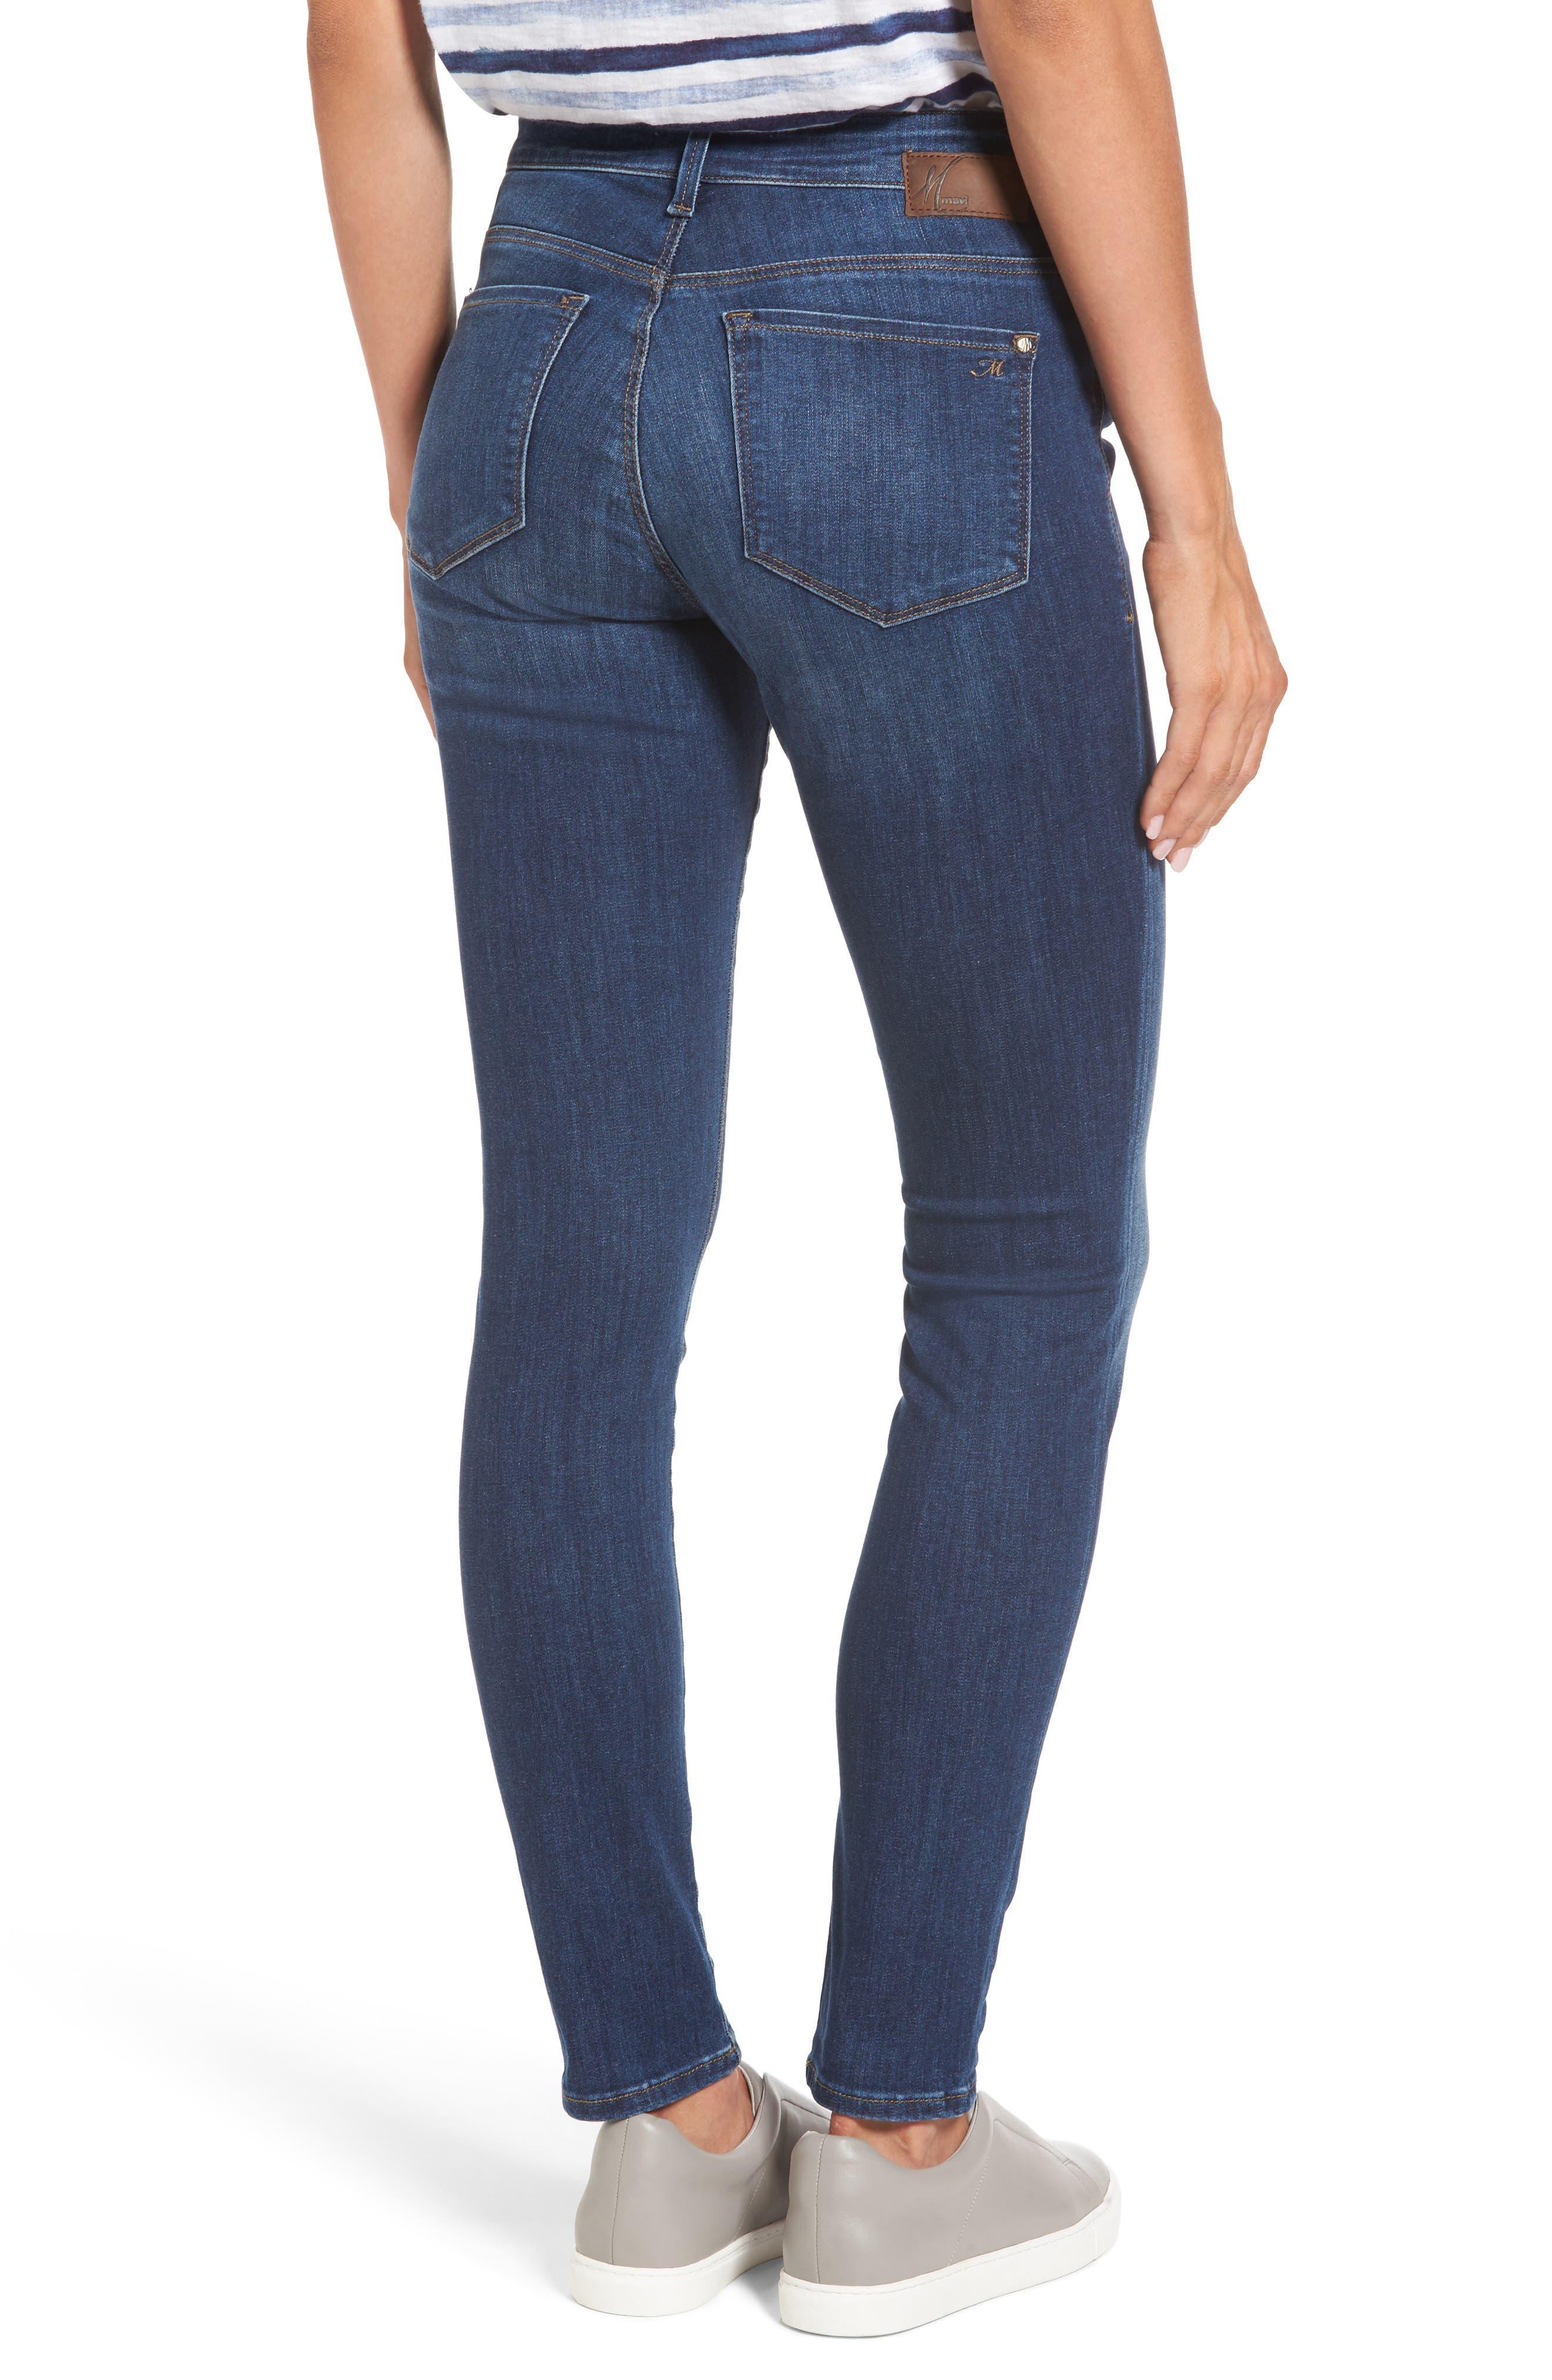 Alissa Super Skinny Jeans,                             Alternate thumbnail 2, color,                             Dark Indigo Tribeca